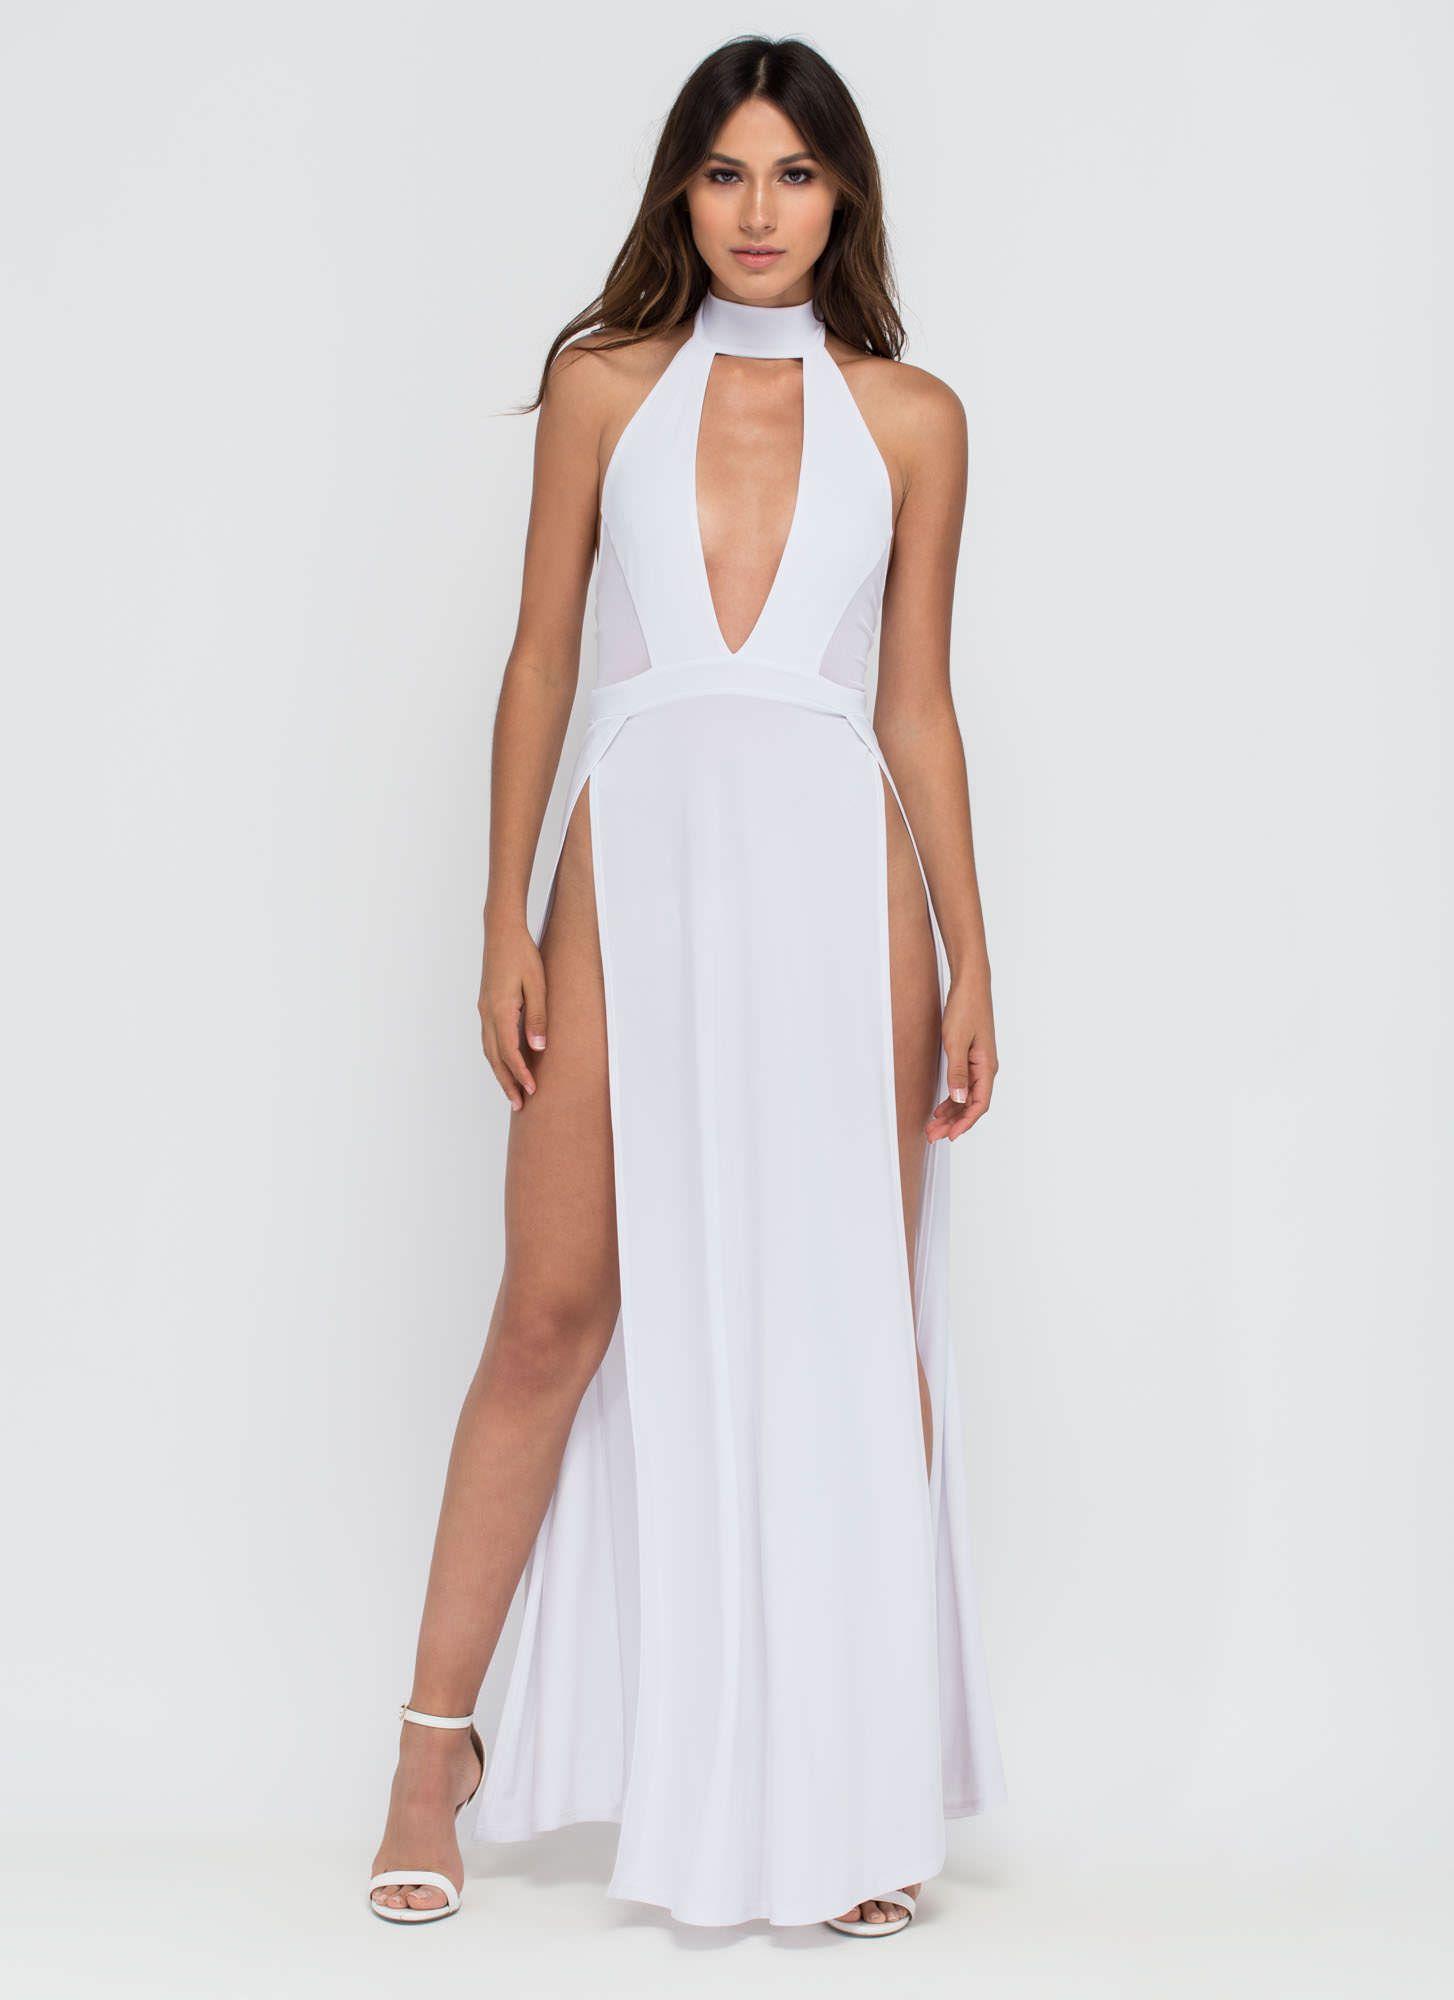 Gojane Black Dress Boulcom Dress Style 2018